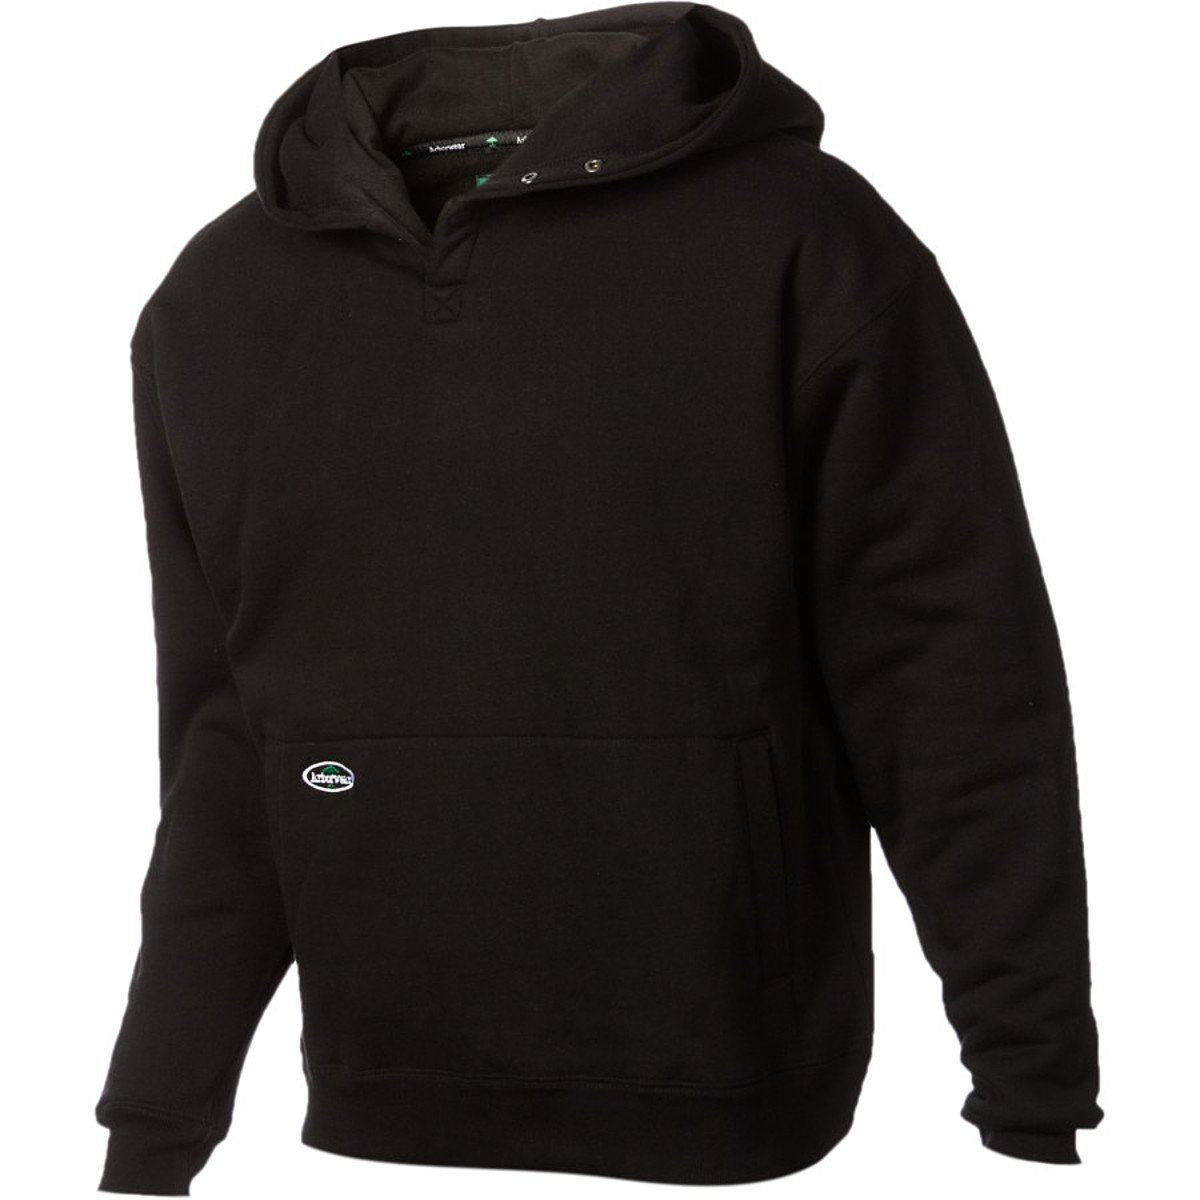 Arborwear Men's Double Thick Pullover Sweatshirt, Black, Small